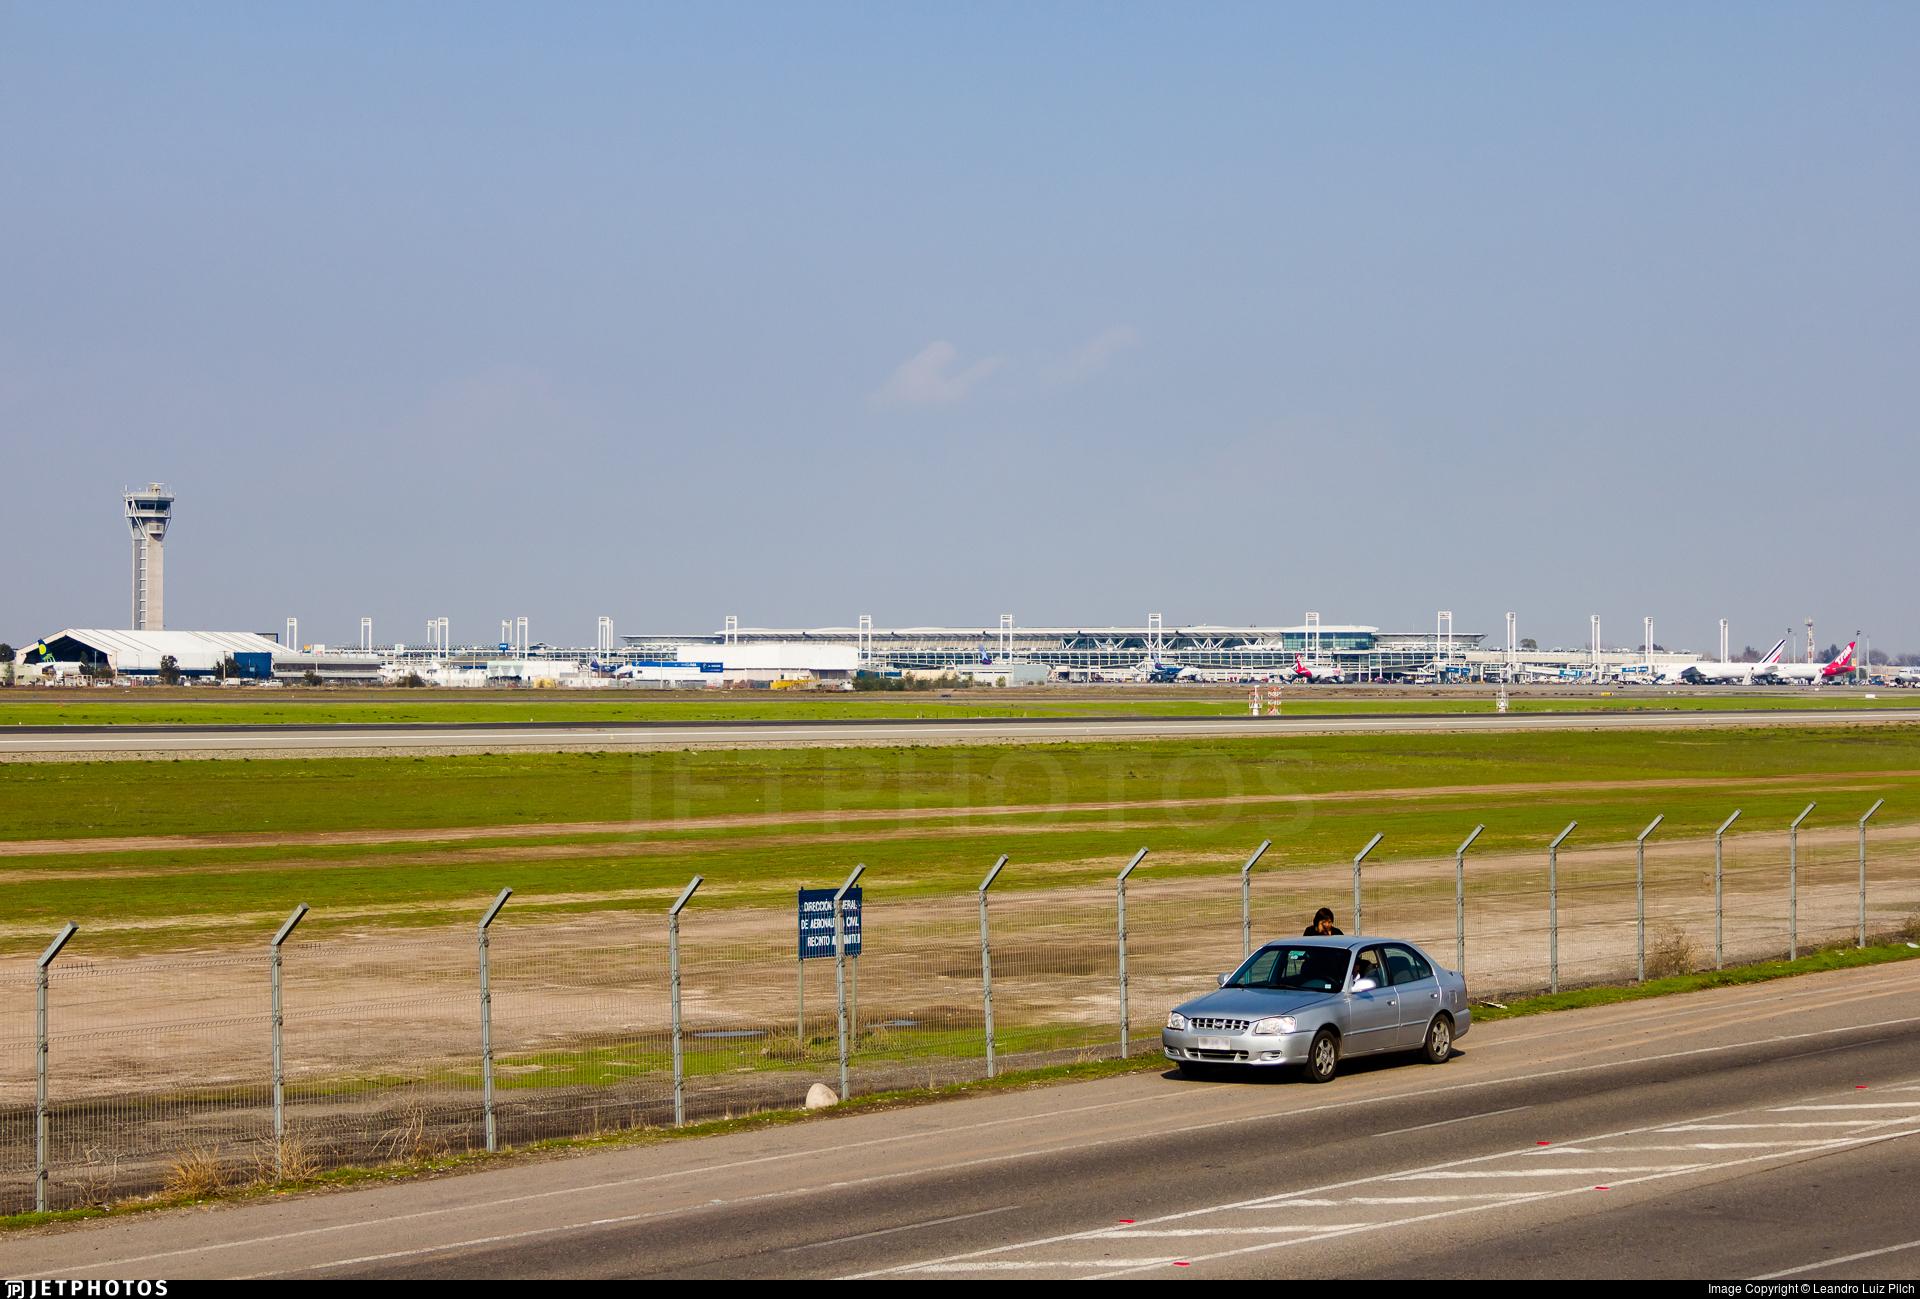 SCEL - Airport - Spotting Location